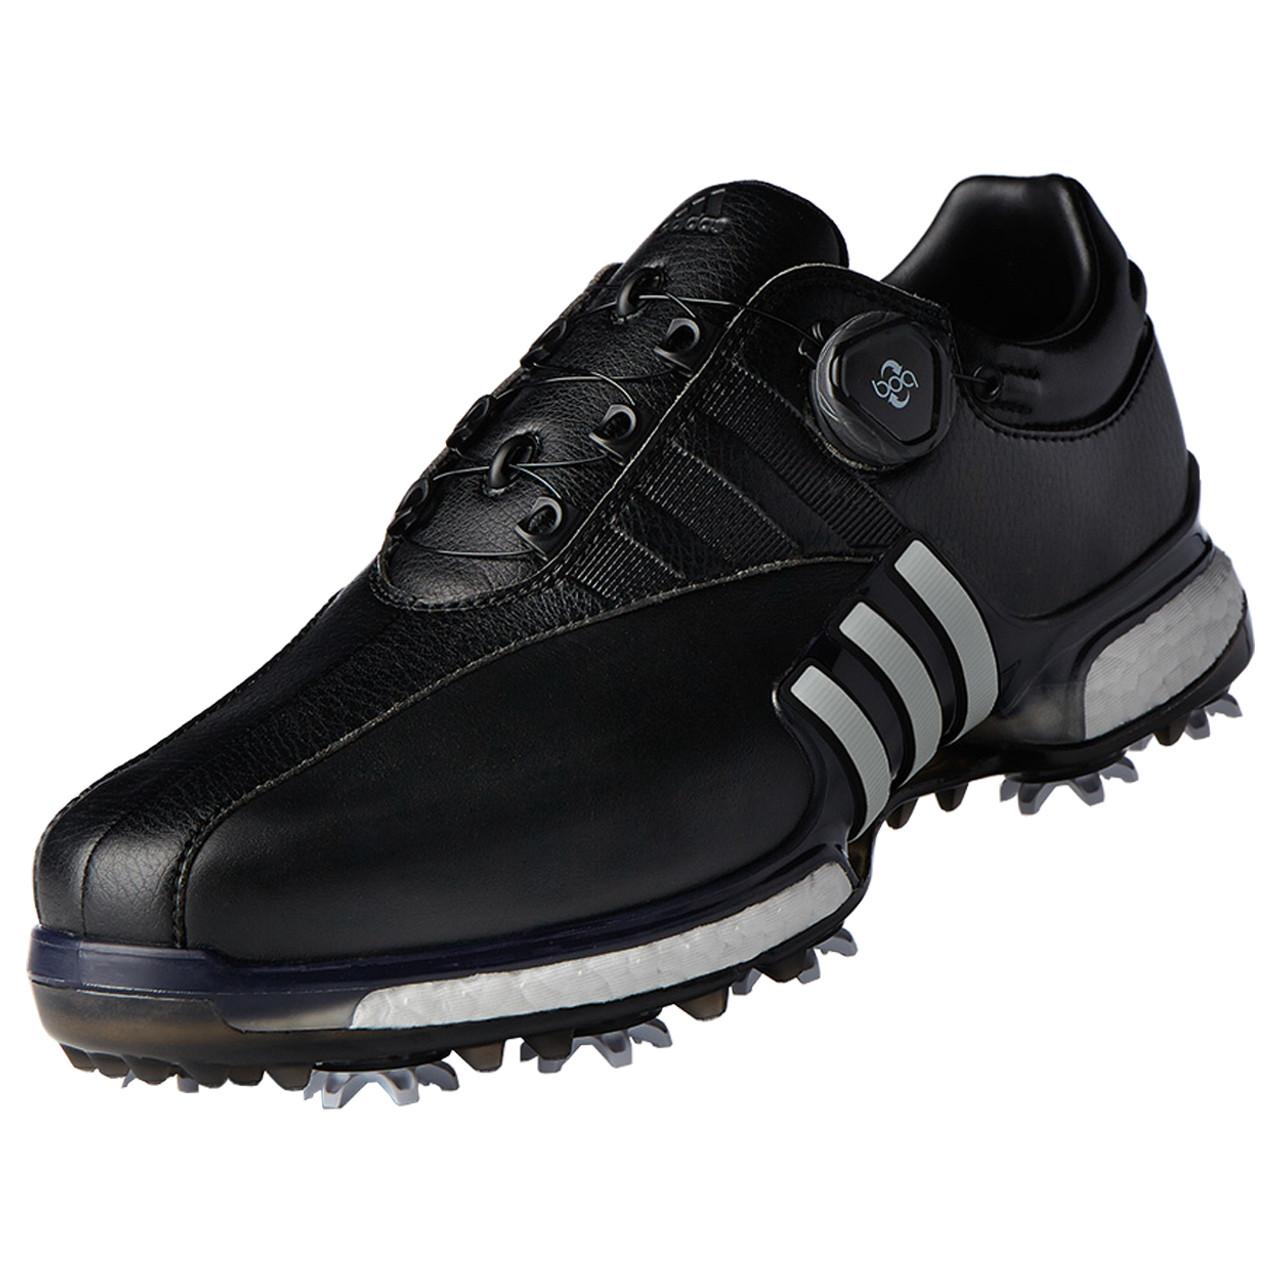 factory price aa954 4a88e Adidas Men's Tour 360 EQT Boa Golf Shoe